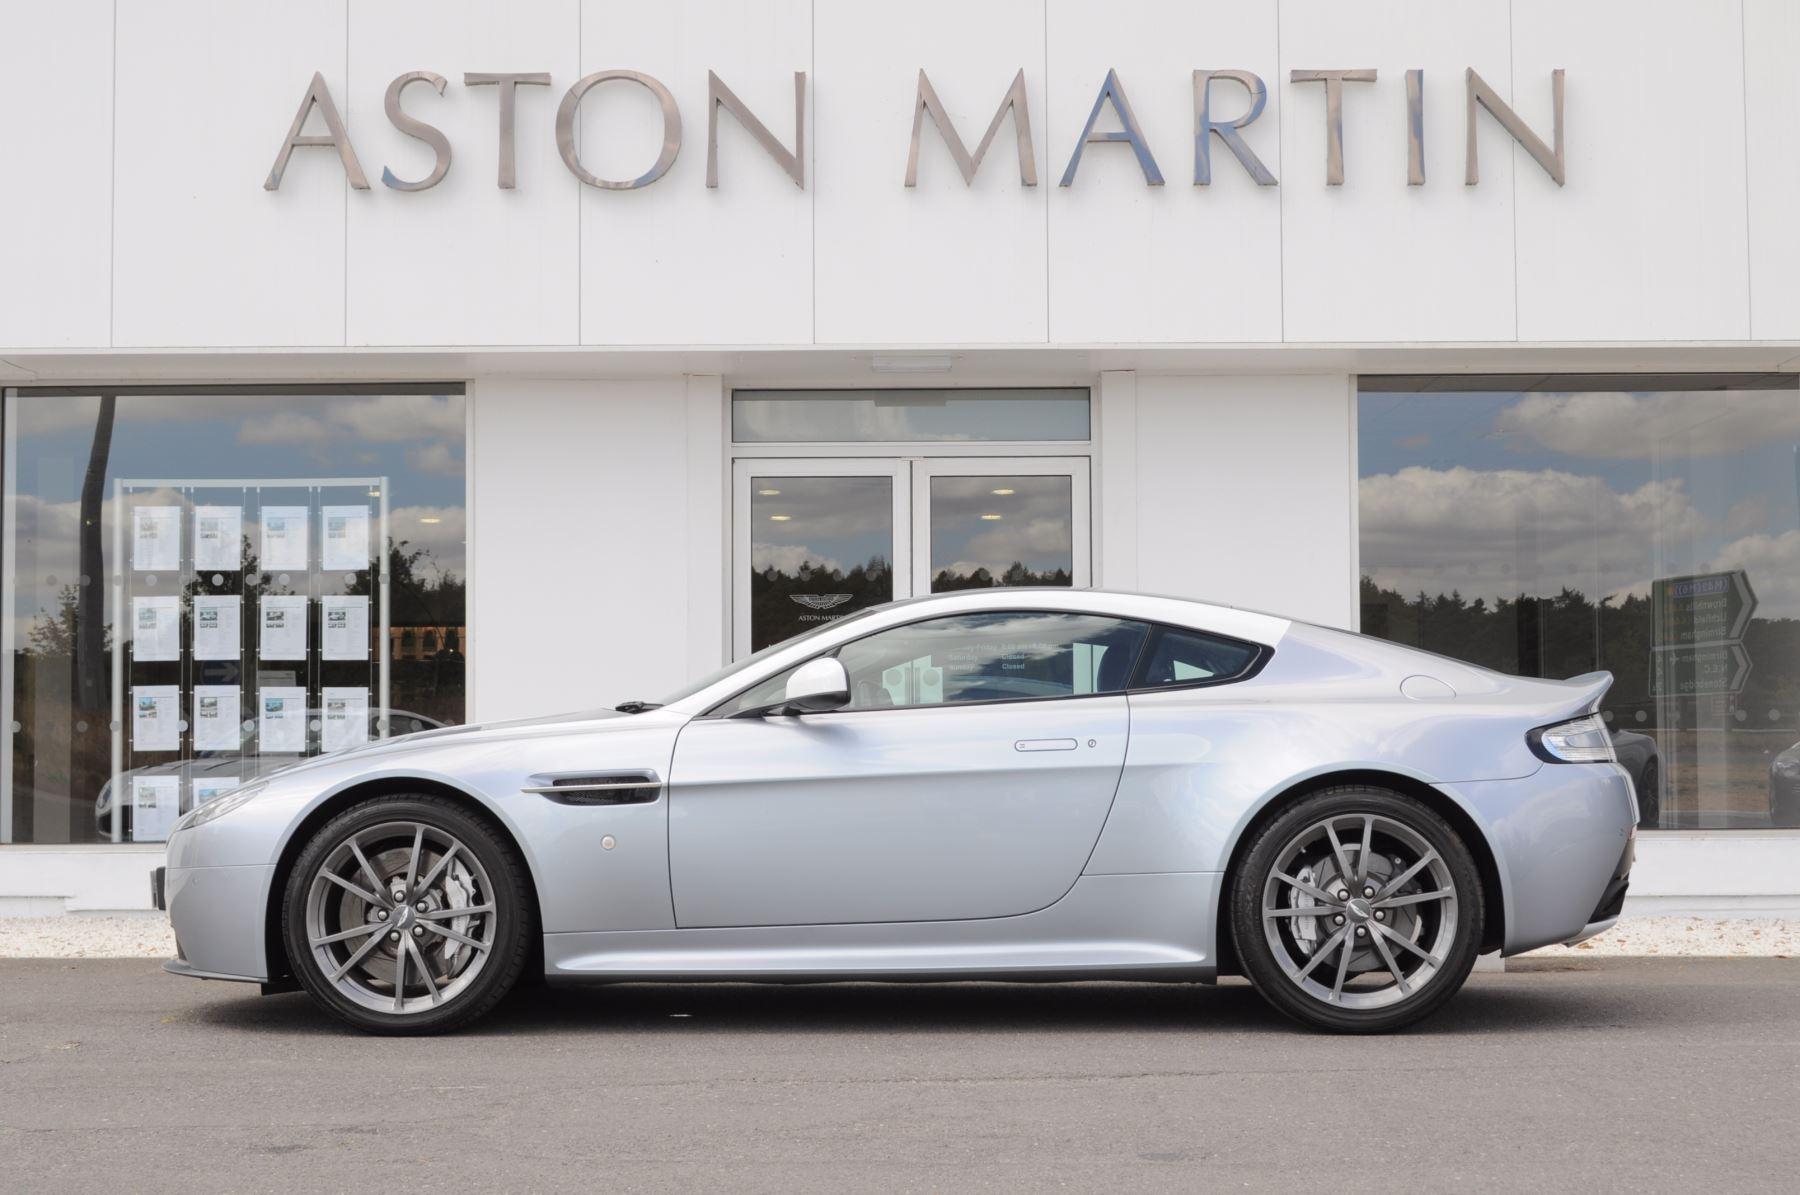 Aston Martin Vantage N430 2dr image 7